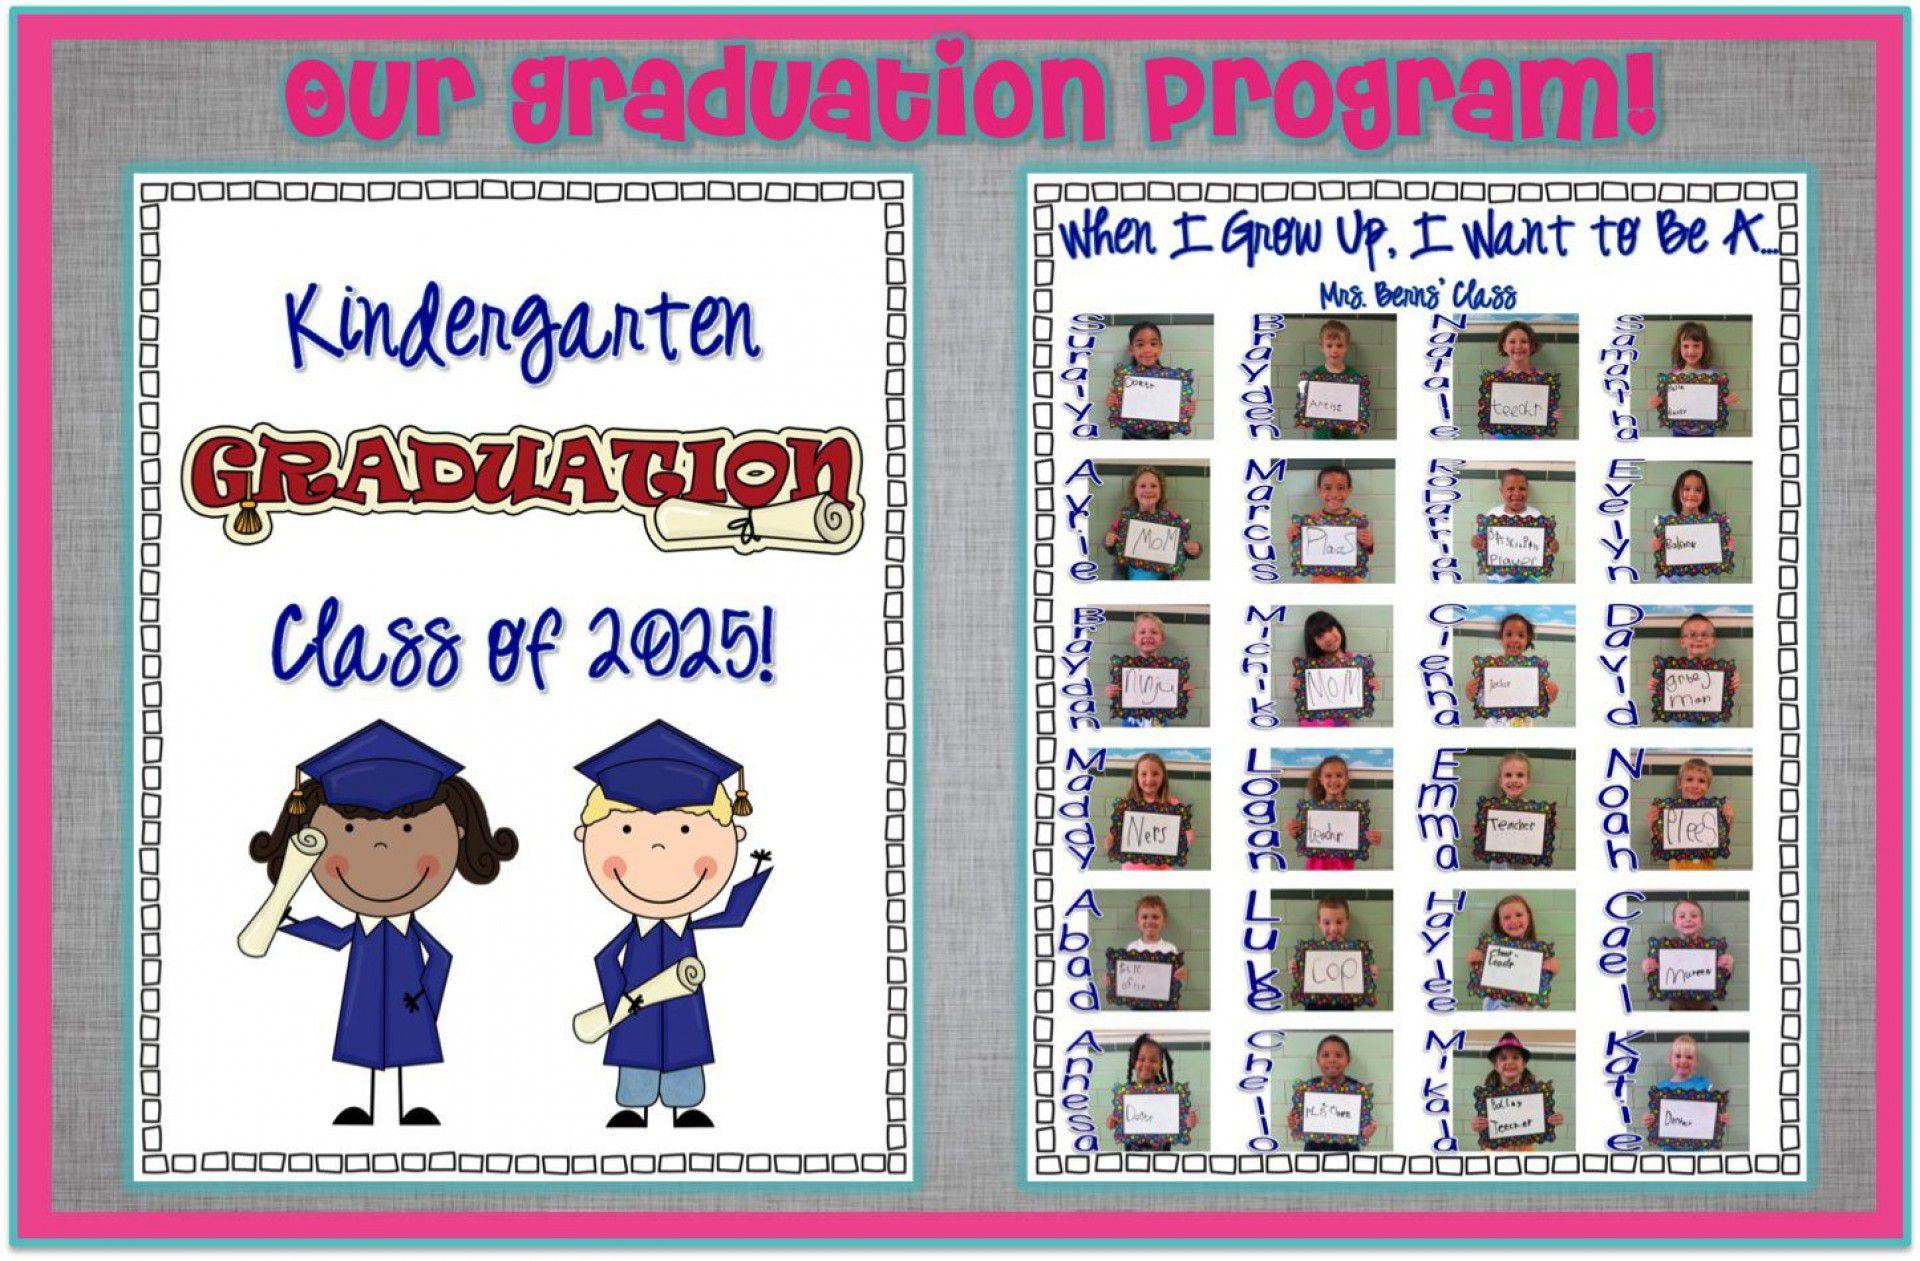 000 Unbelievable Preschool Graduation Program Template Concept  Templates Free Printable PdfFull